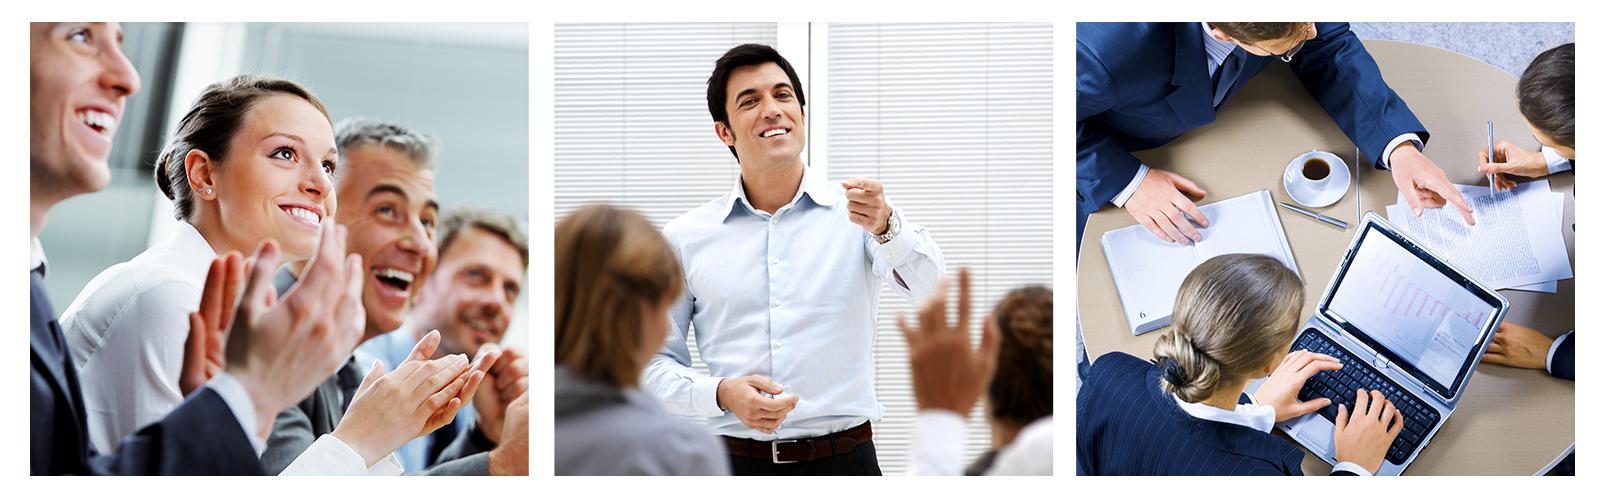 Recomendaciones para ser un buen líder